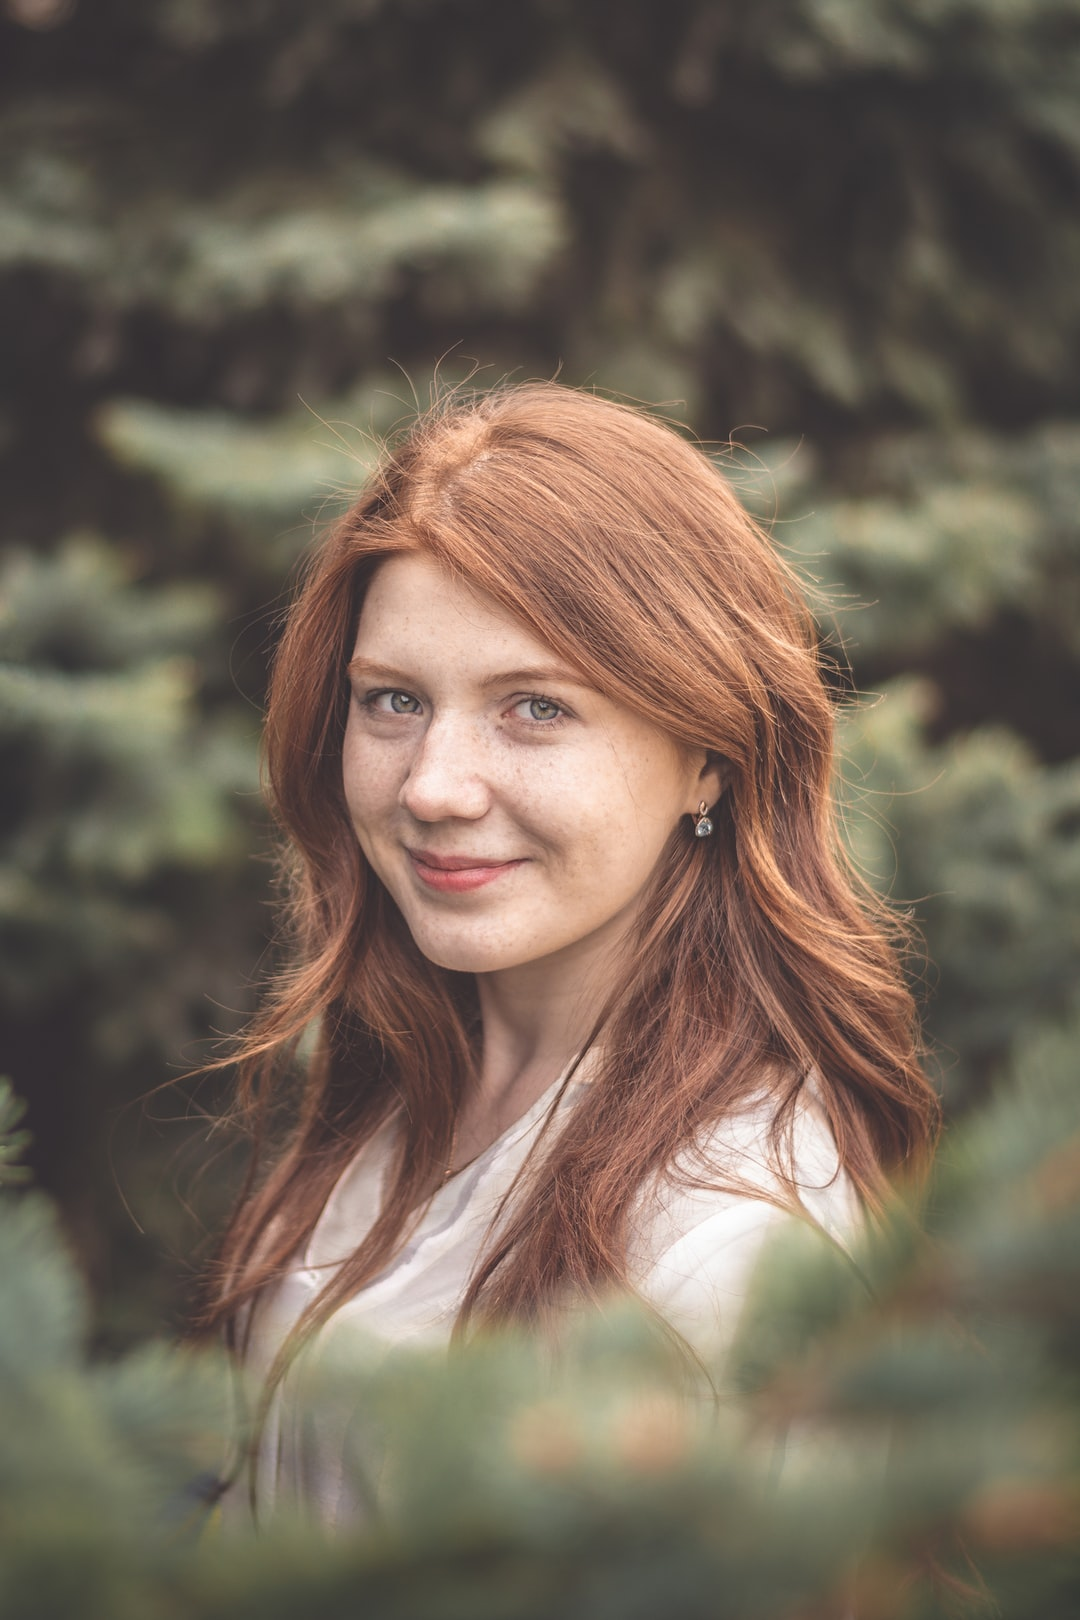 Photo by Vladislav Nikonov on Unsplash